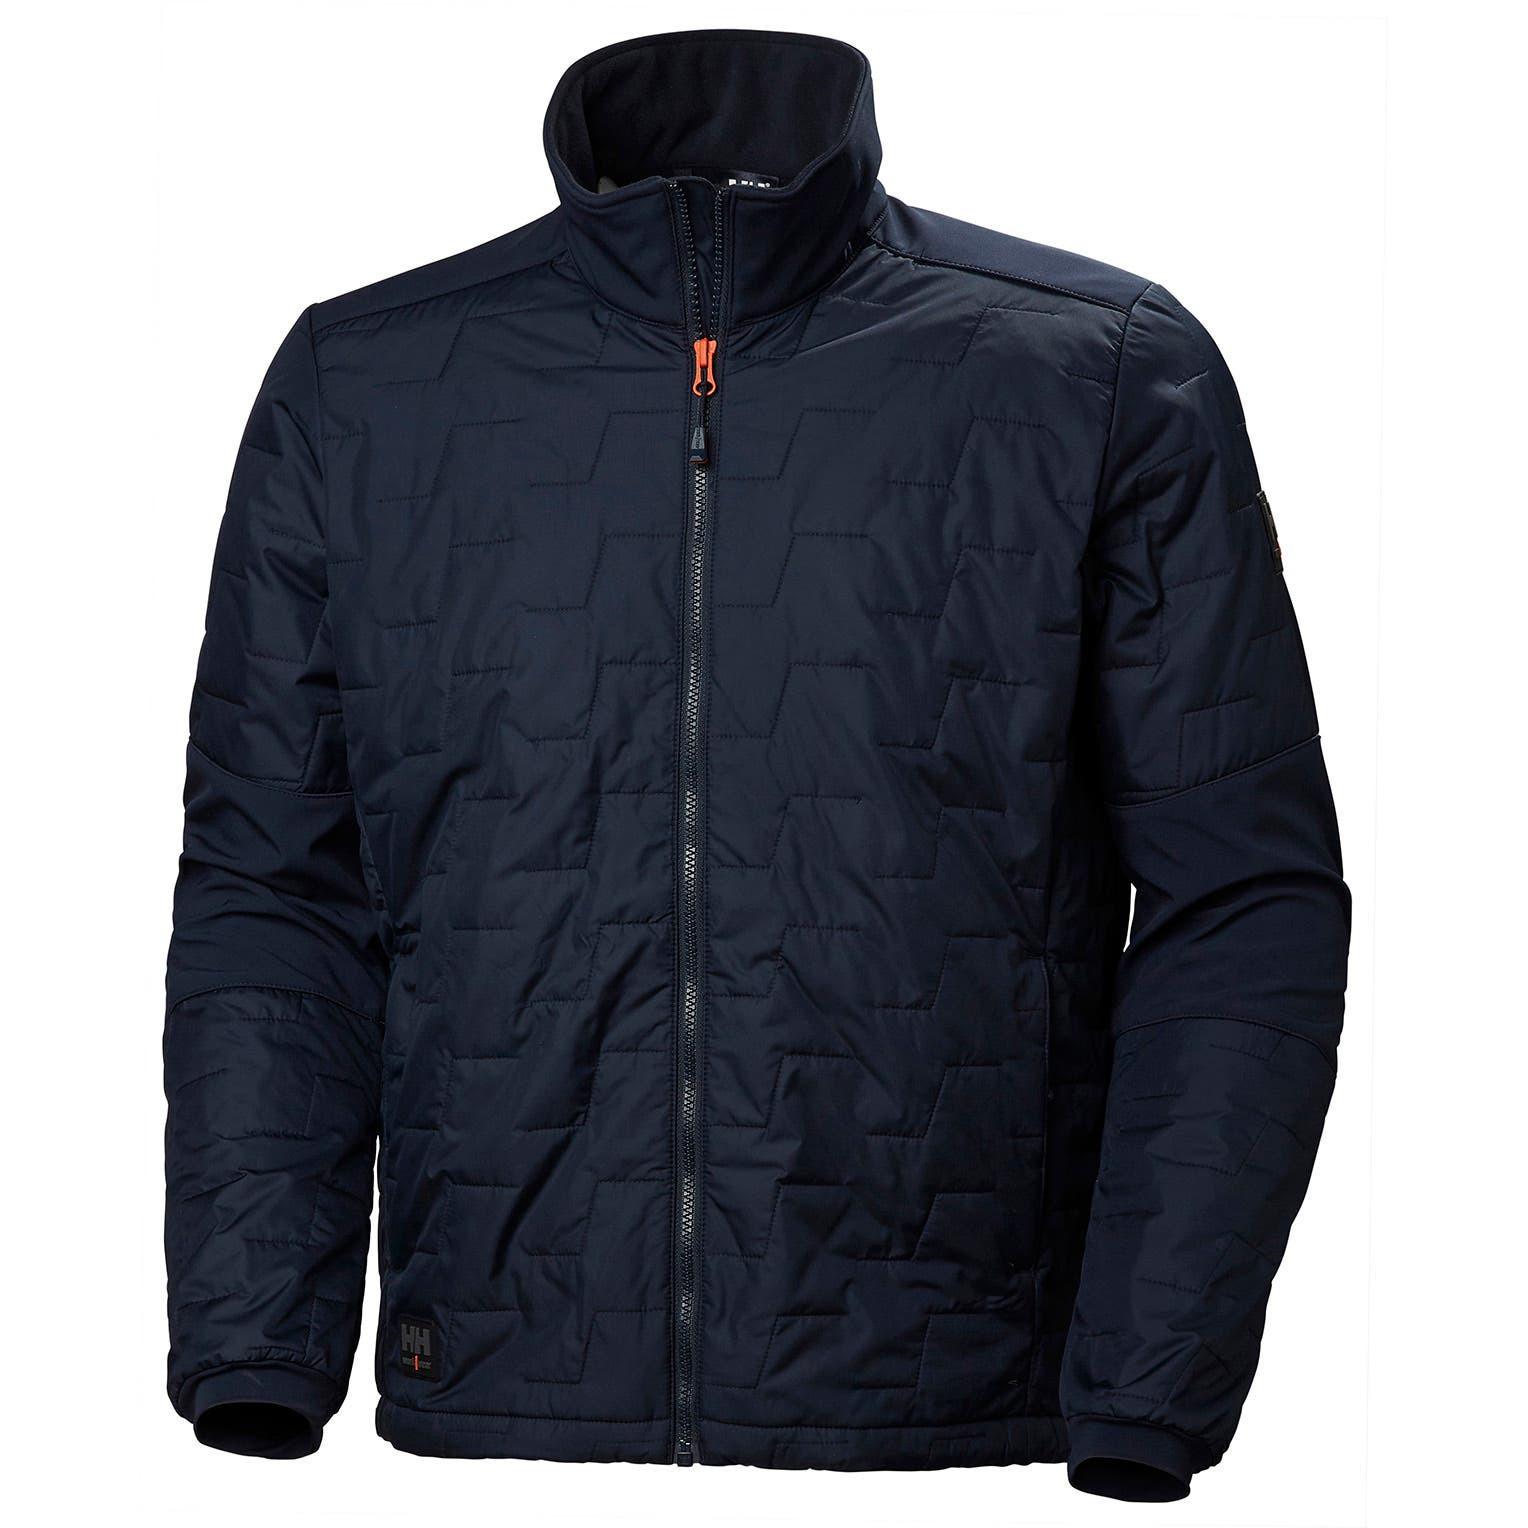 Куртка Helly Hansen Kensington Lifaloft Jacket - 73231 (Navy; S)